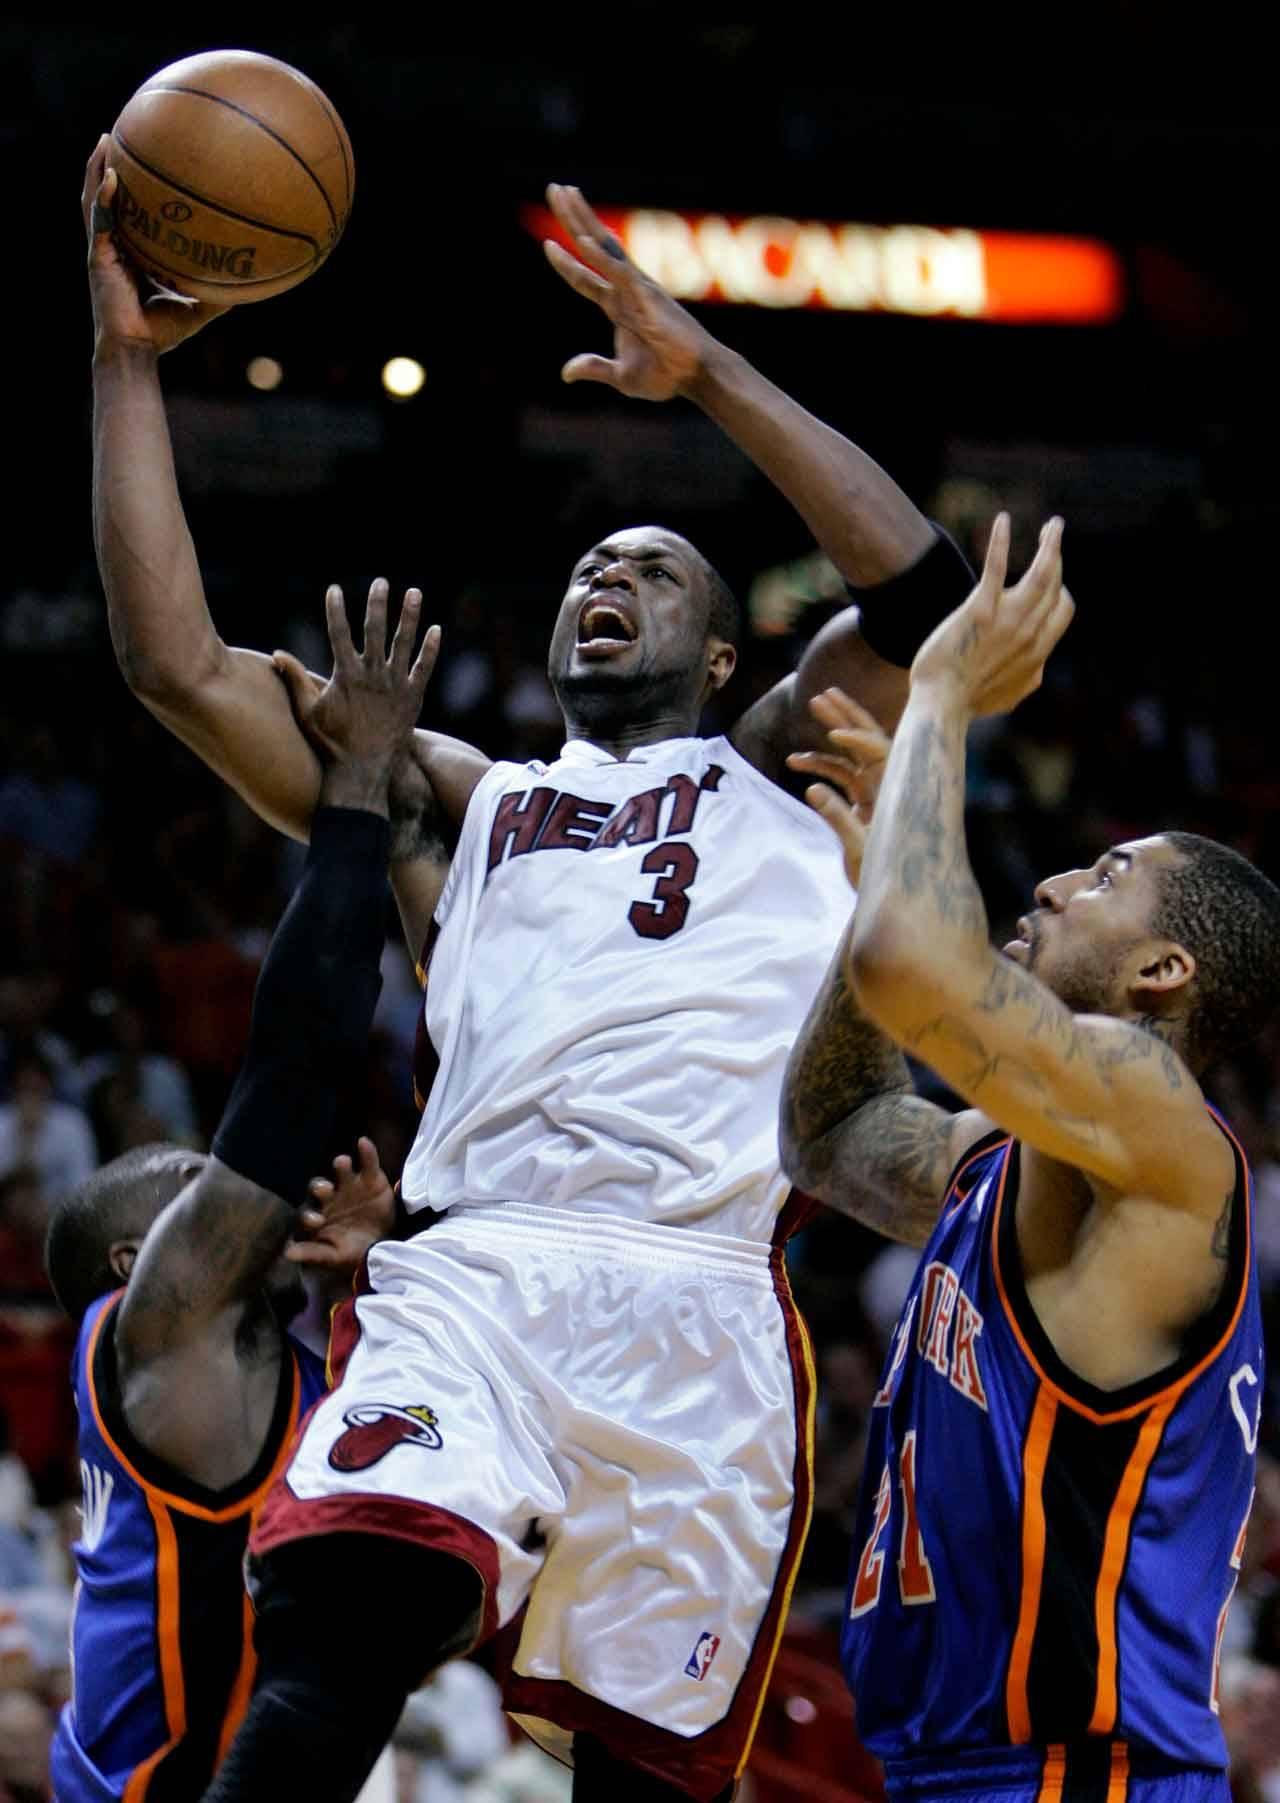 Dwyane Wade career-high 55 points vs New York Knicks, April 12, 2009